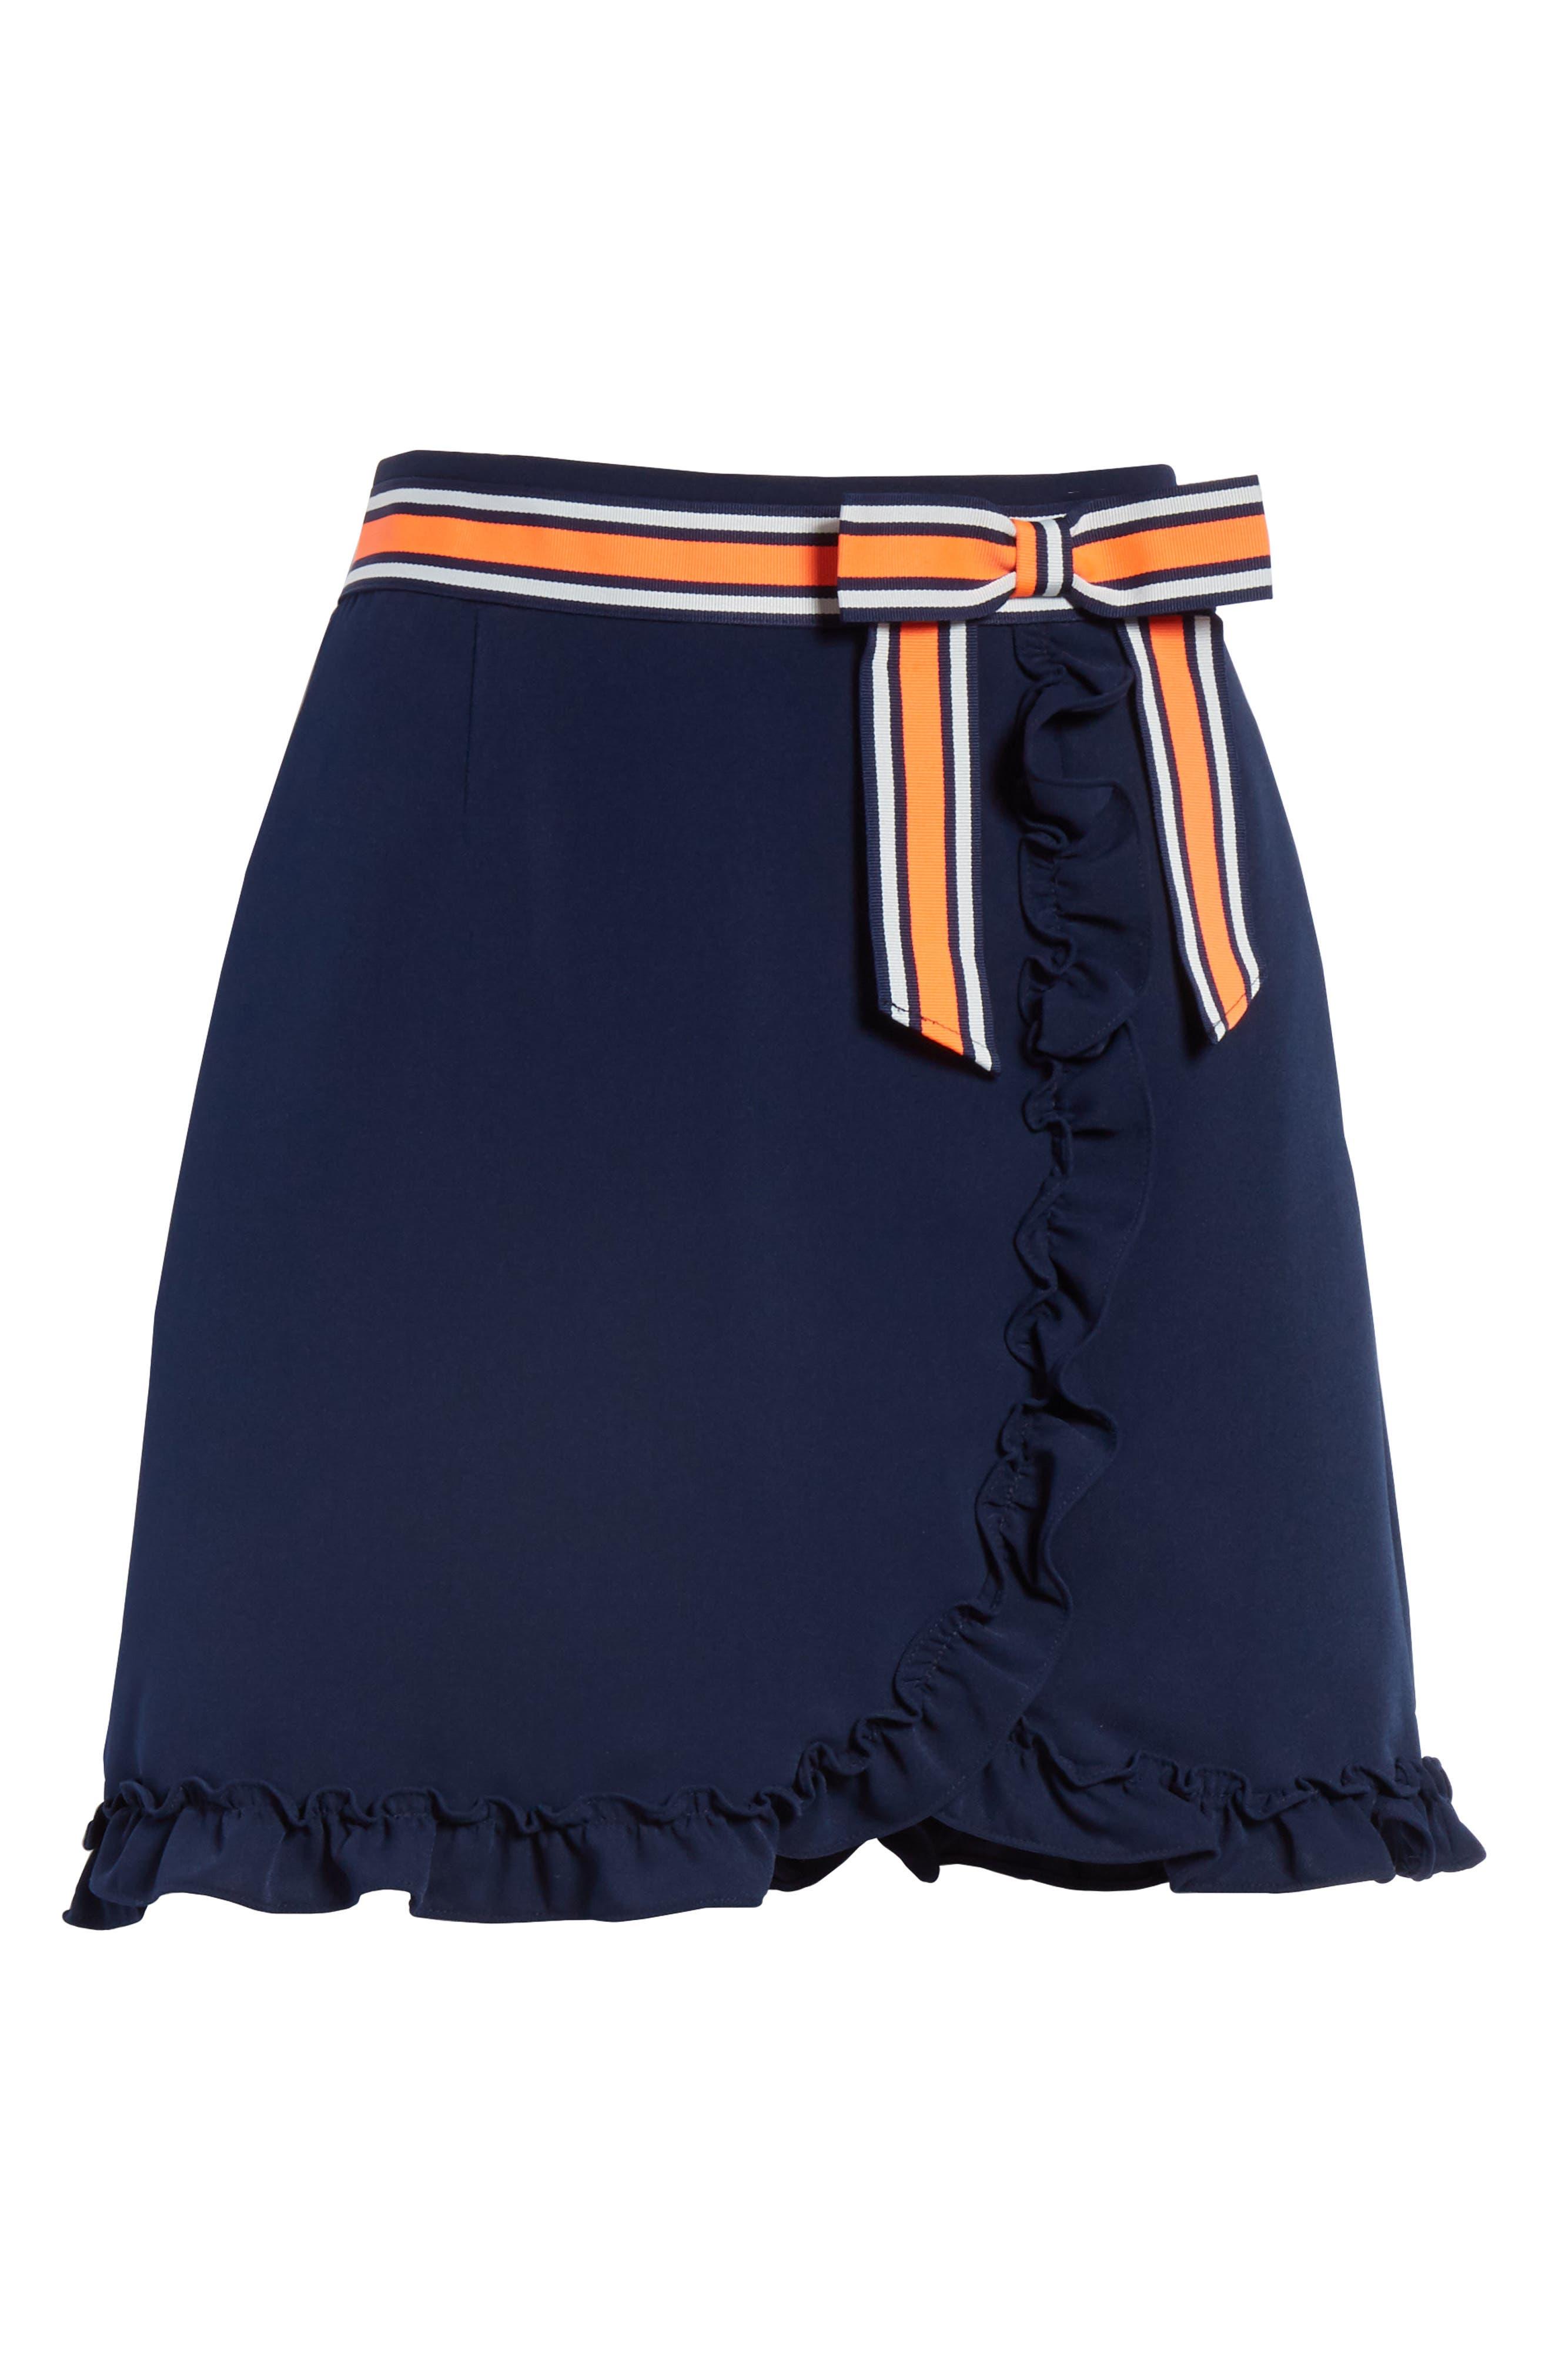 Xzenia Bow Miniskirt,                             Alternate thumbnail 6, color,                             Navy